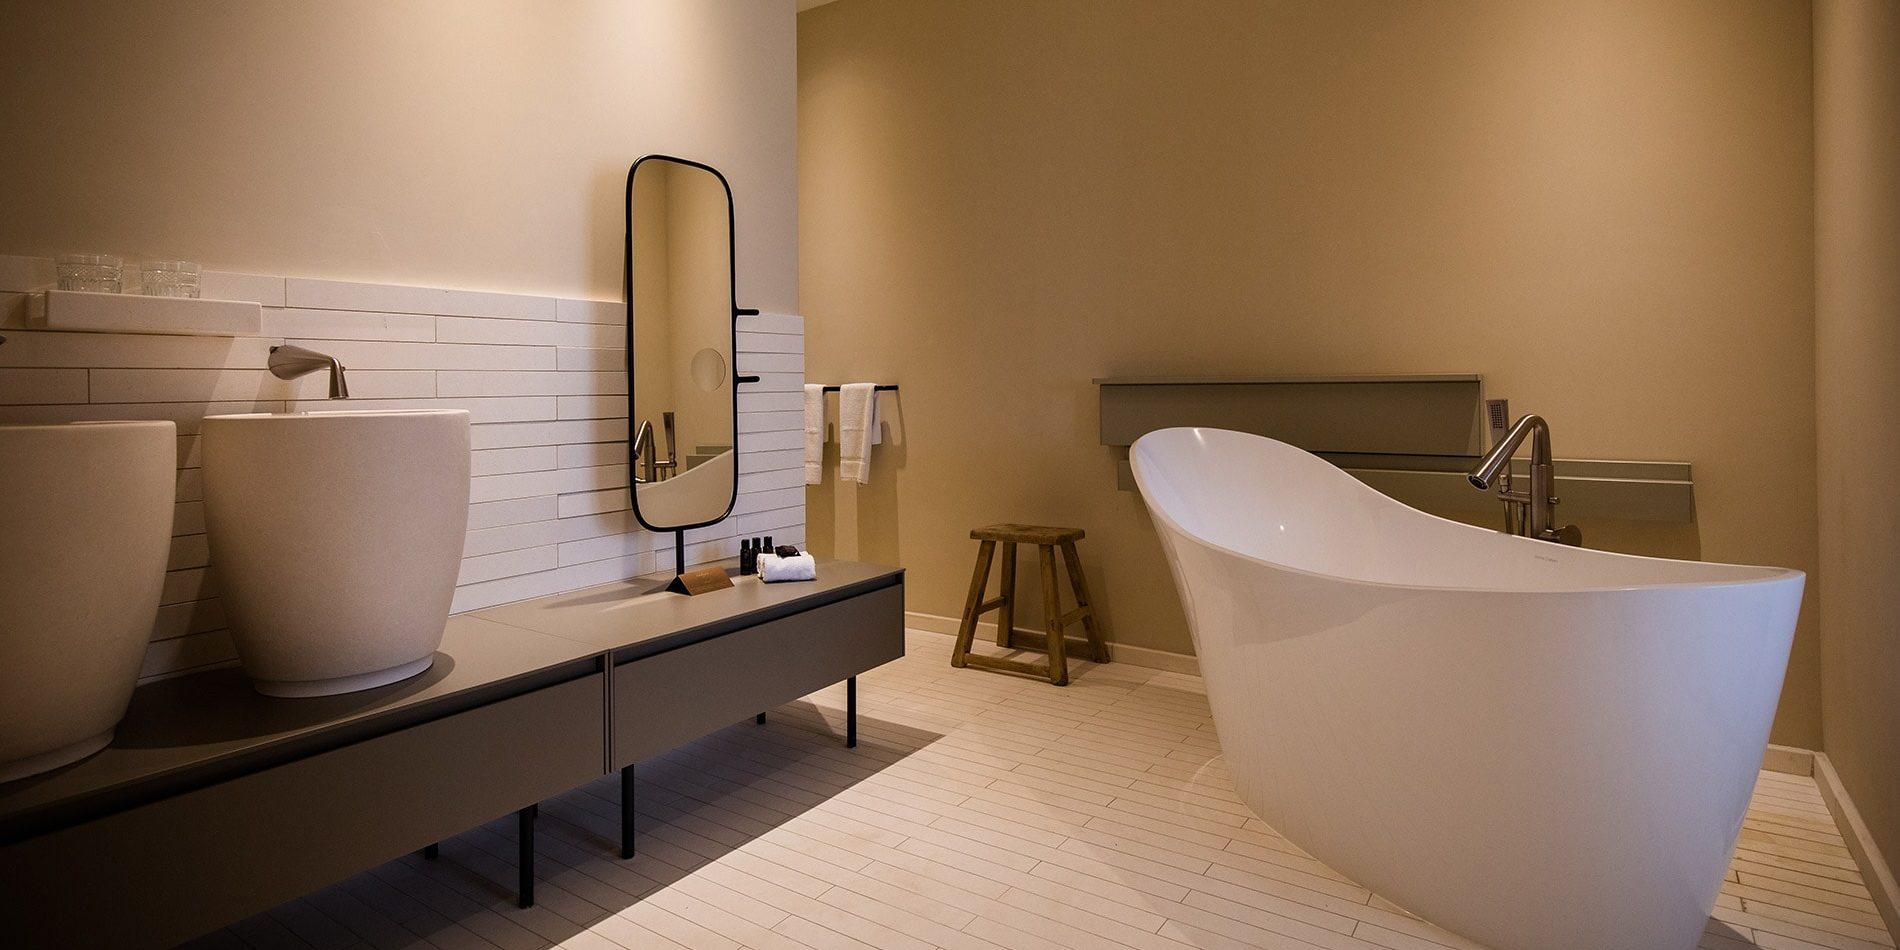 Hotel Misincu Cagnano Cap Corse Corsica Frankrijk badkamer bad spiegel amenities